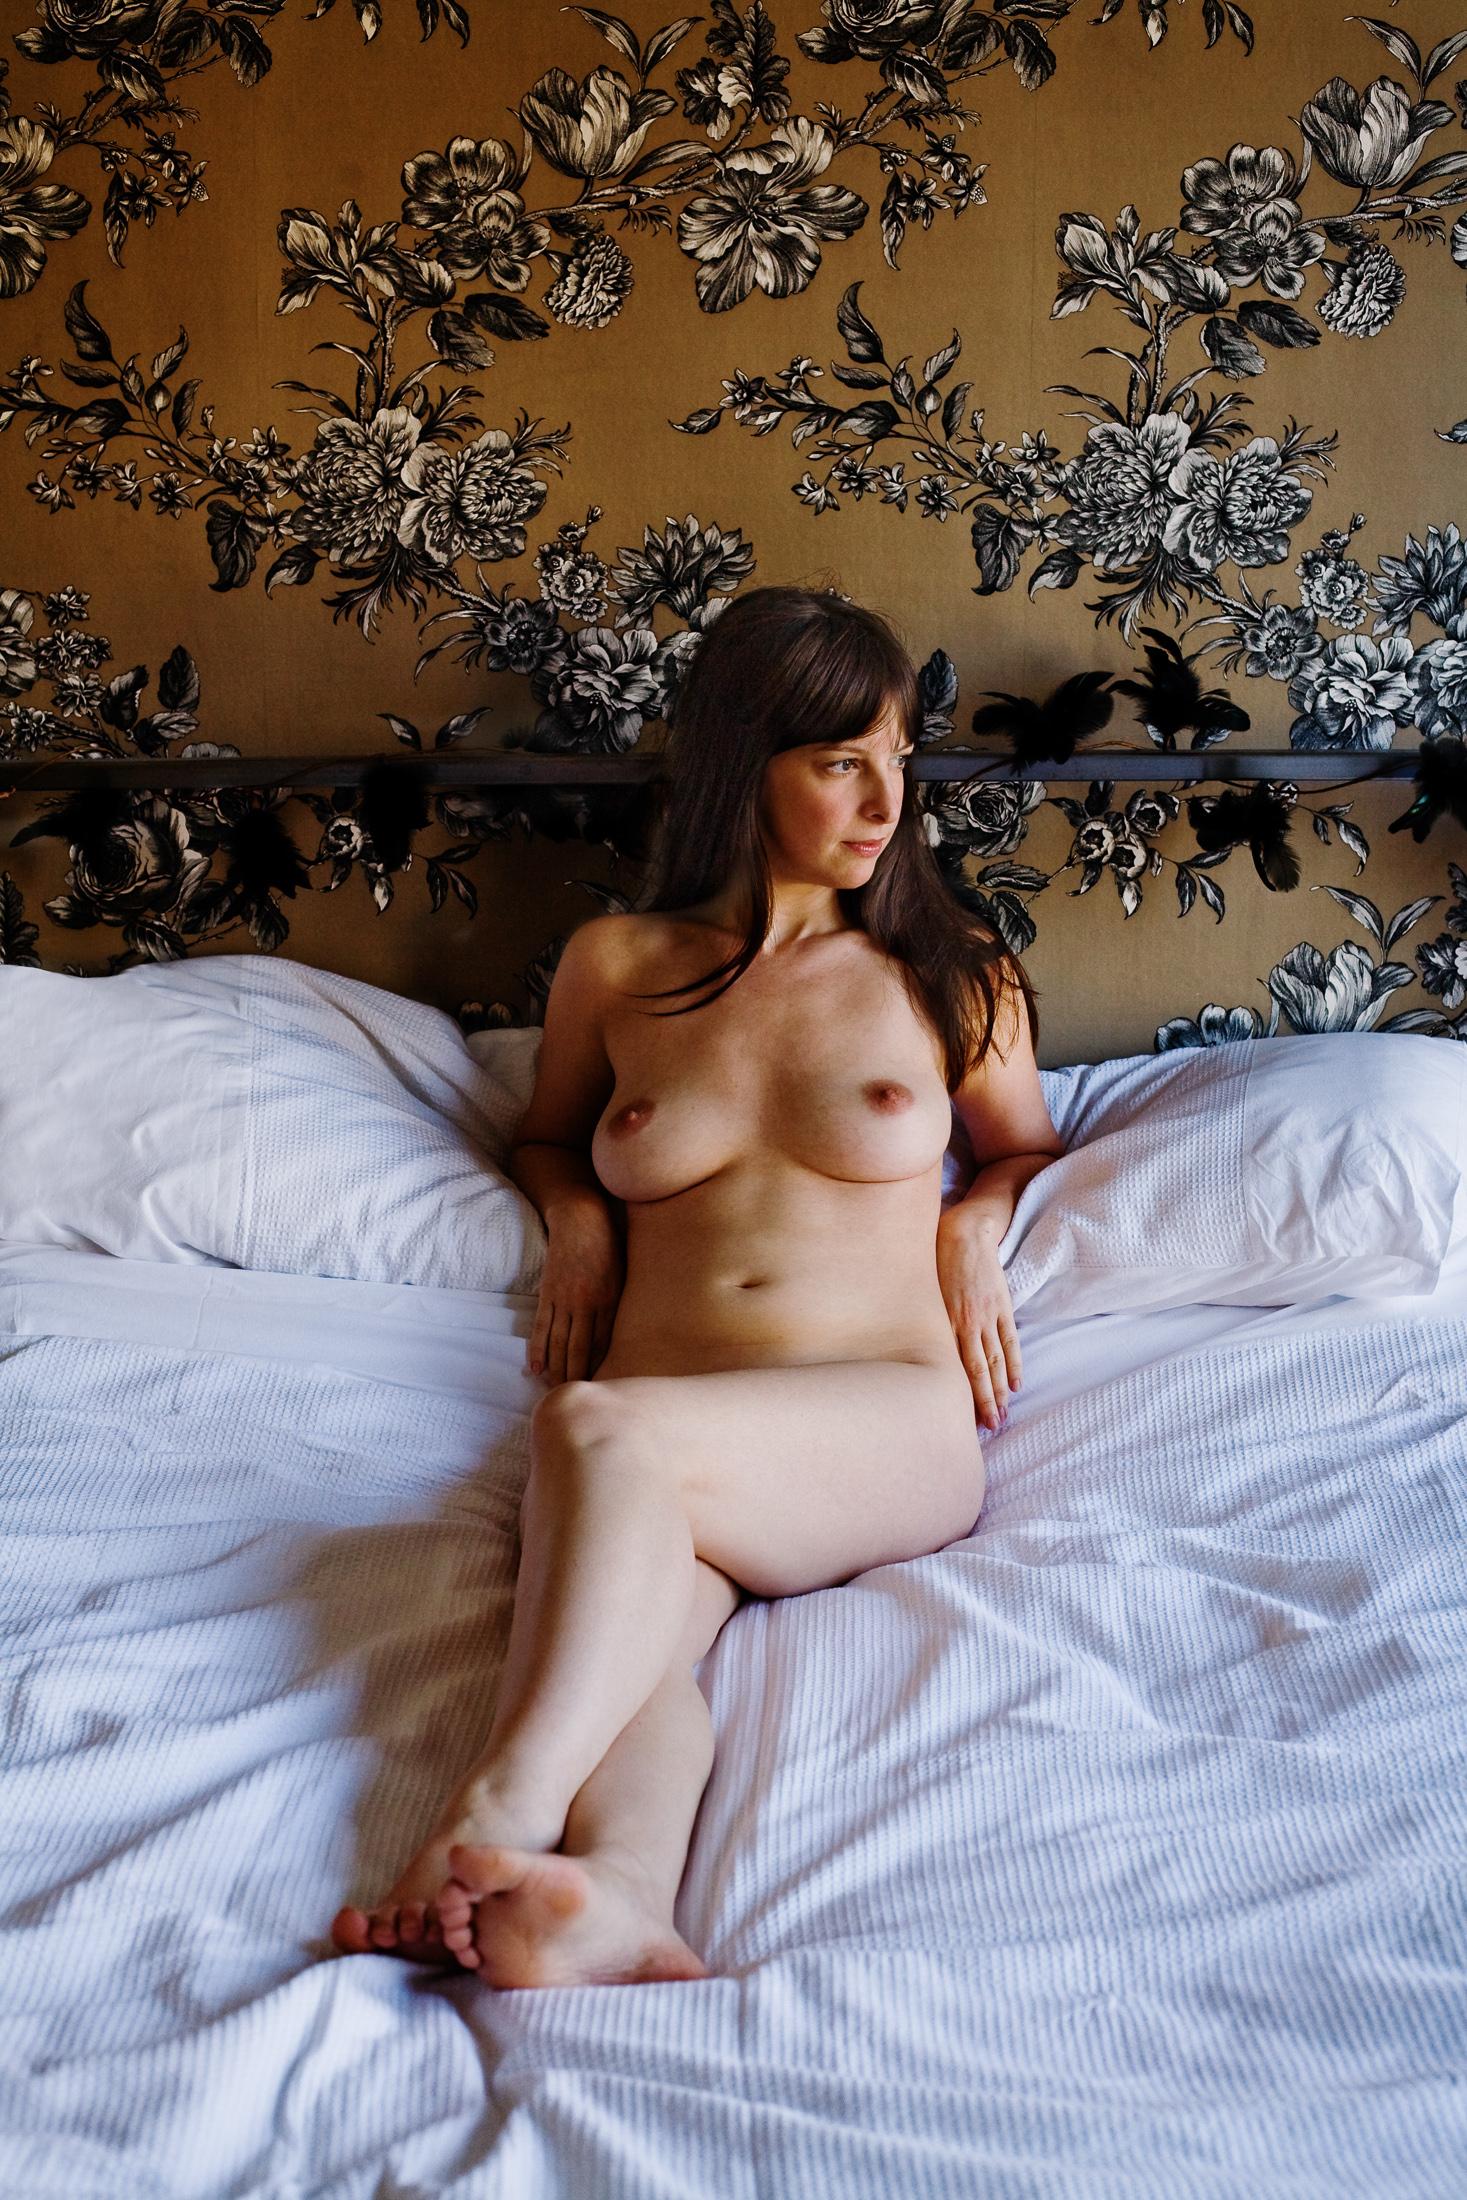 Sarah Lisbette